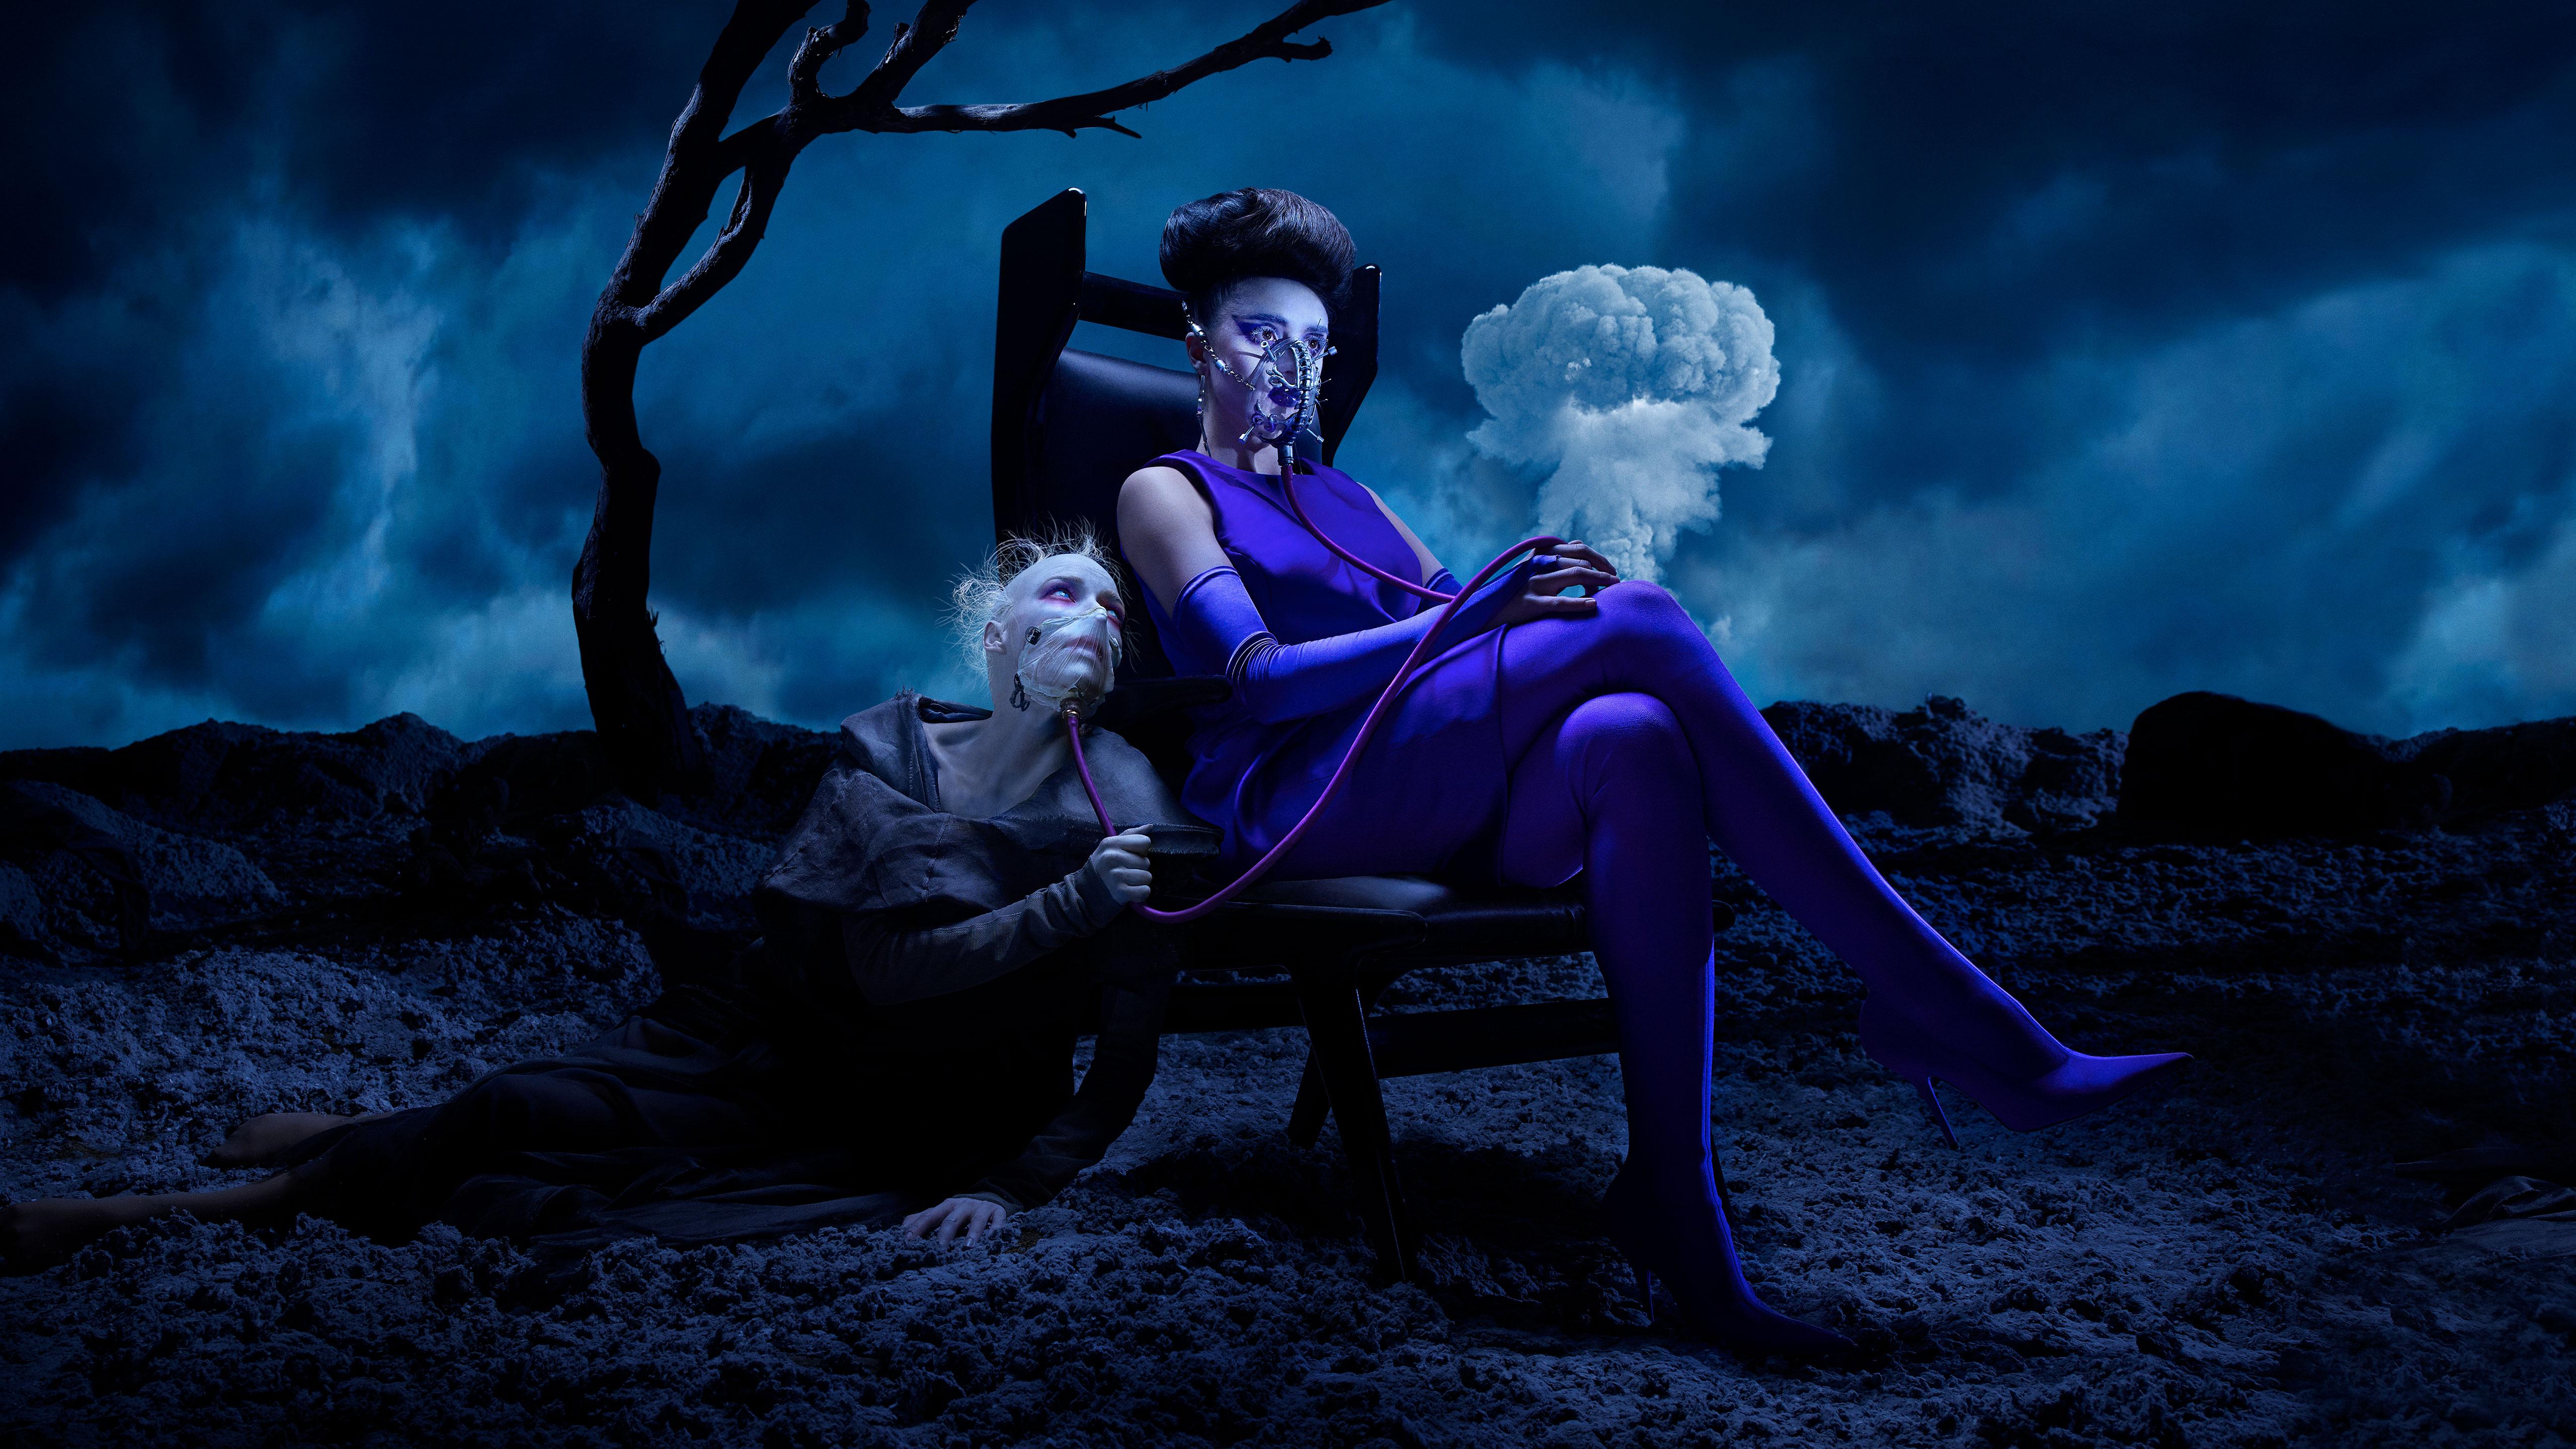 American Horror Story Hd Wallpaper: American Horror Story Apocalypse 5k, HD Tv Shows, 4k